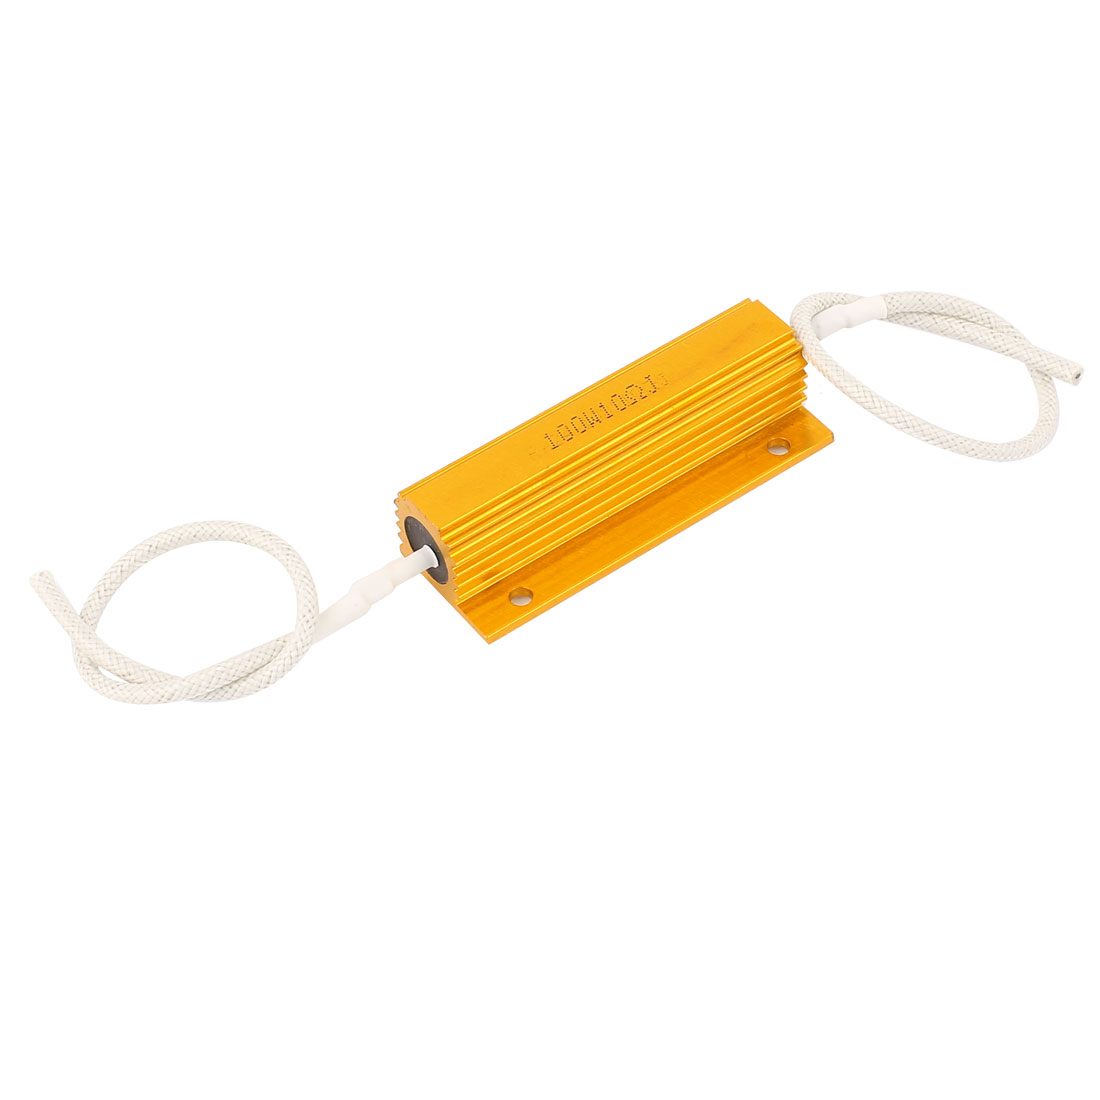 Car Aluminum 10 Ohm 100W 5% Wire Wound Loudspeaker Clad Resistor Gold Tone